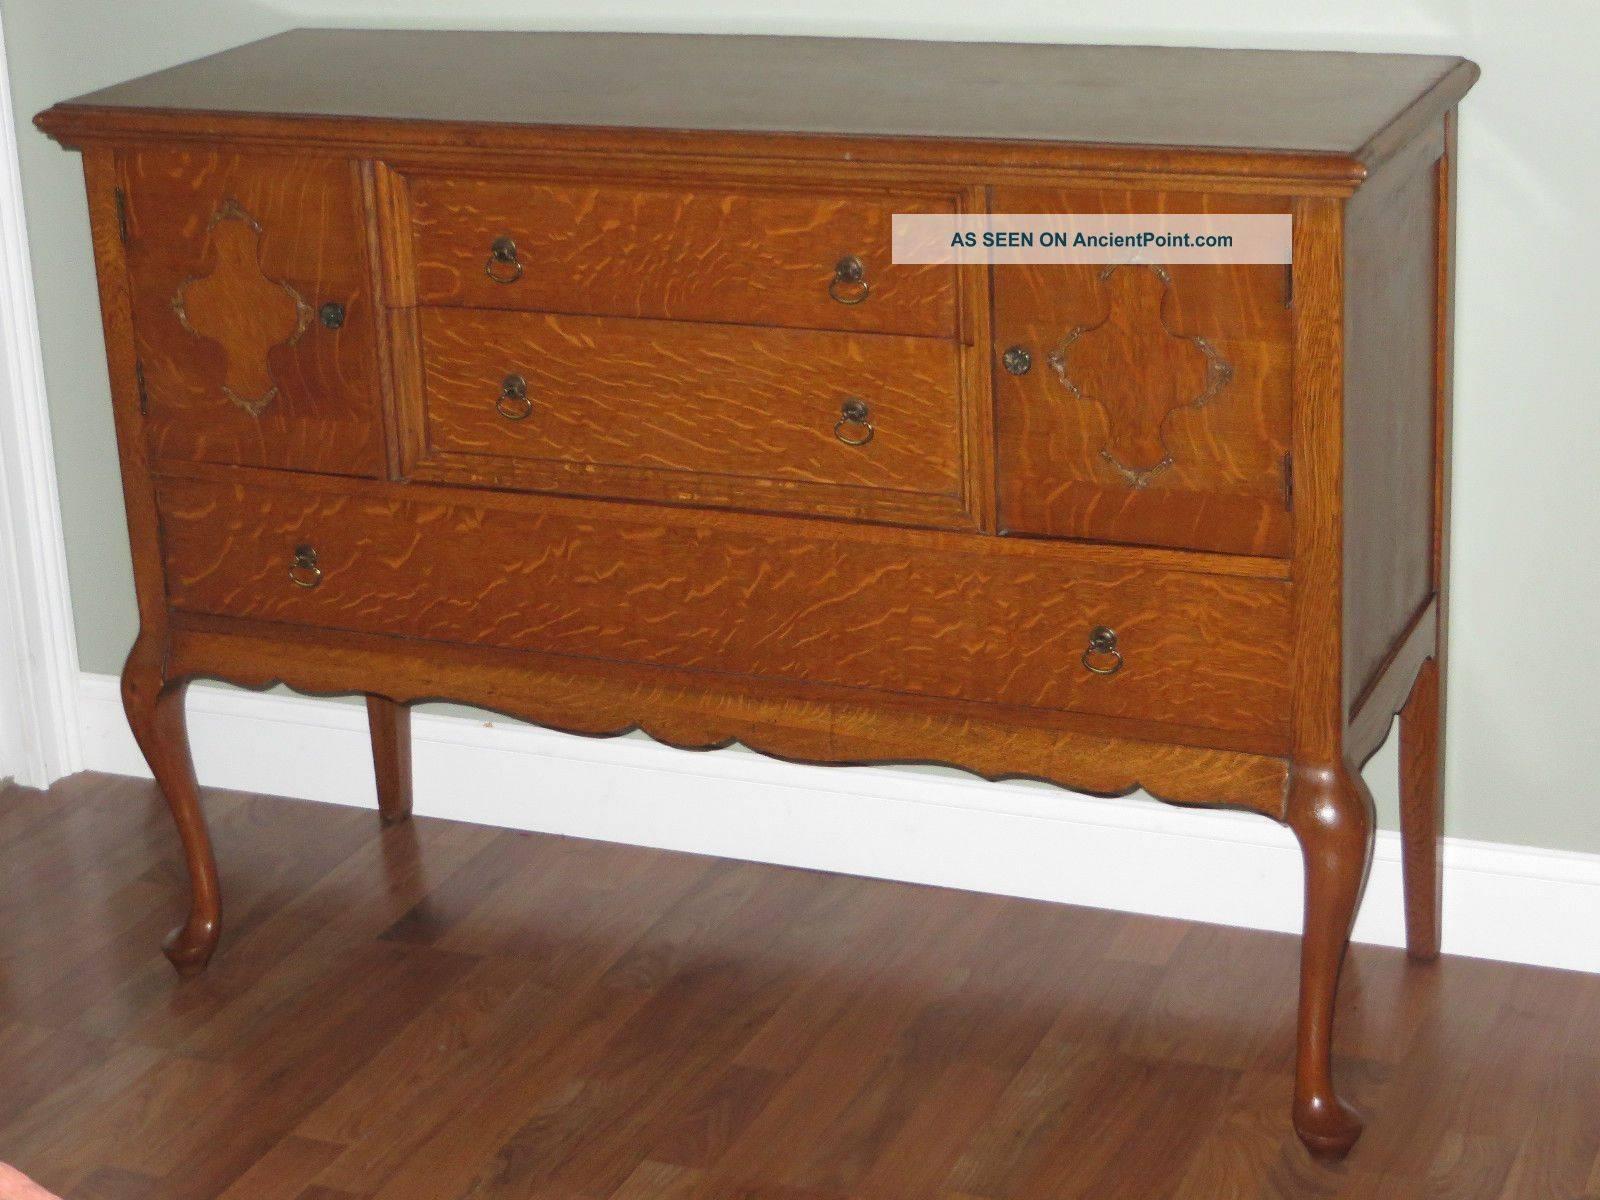 Antique Buffet Value Antique Tiger Oak Sideboard Buffet Server For Antique Sideboards And Buffets (View 12 of 15)